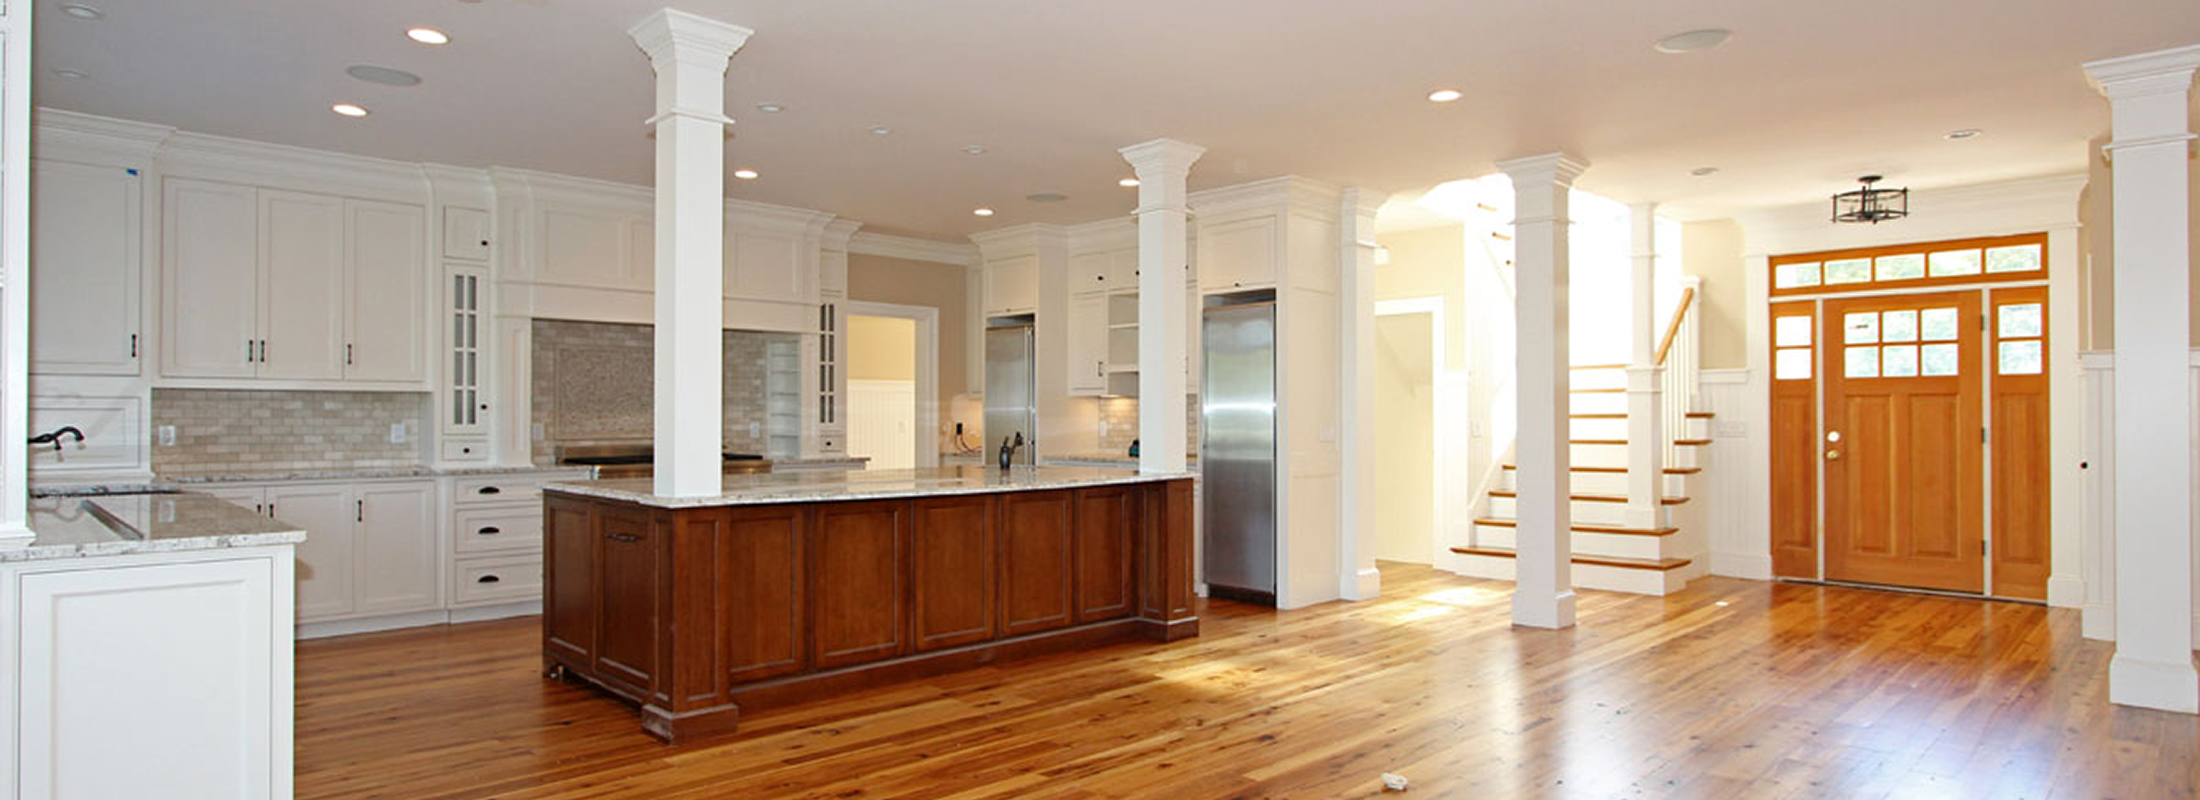 Keystone Custom Builders U2013 Development, Fine Home Builder, High ...